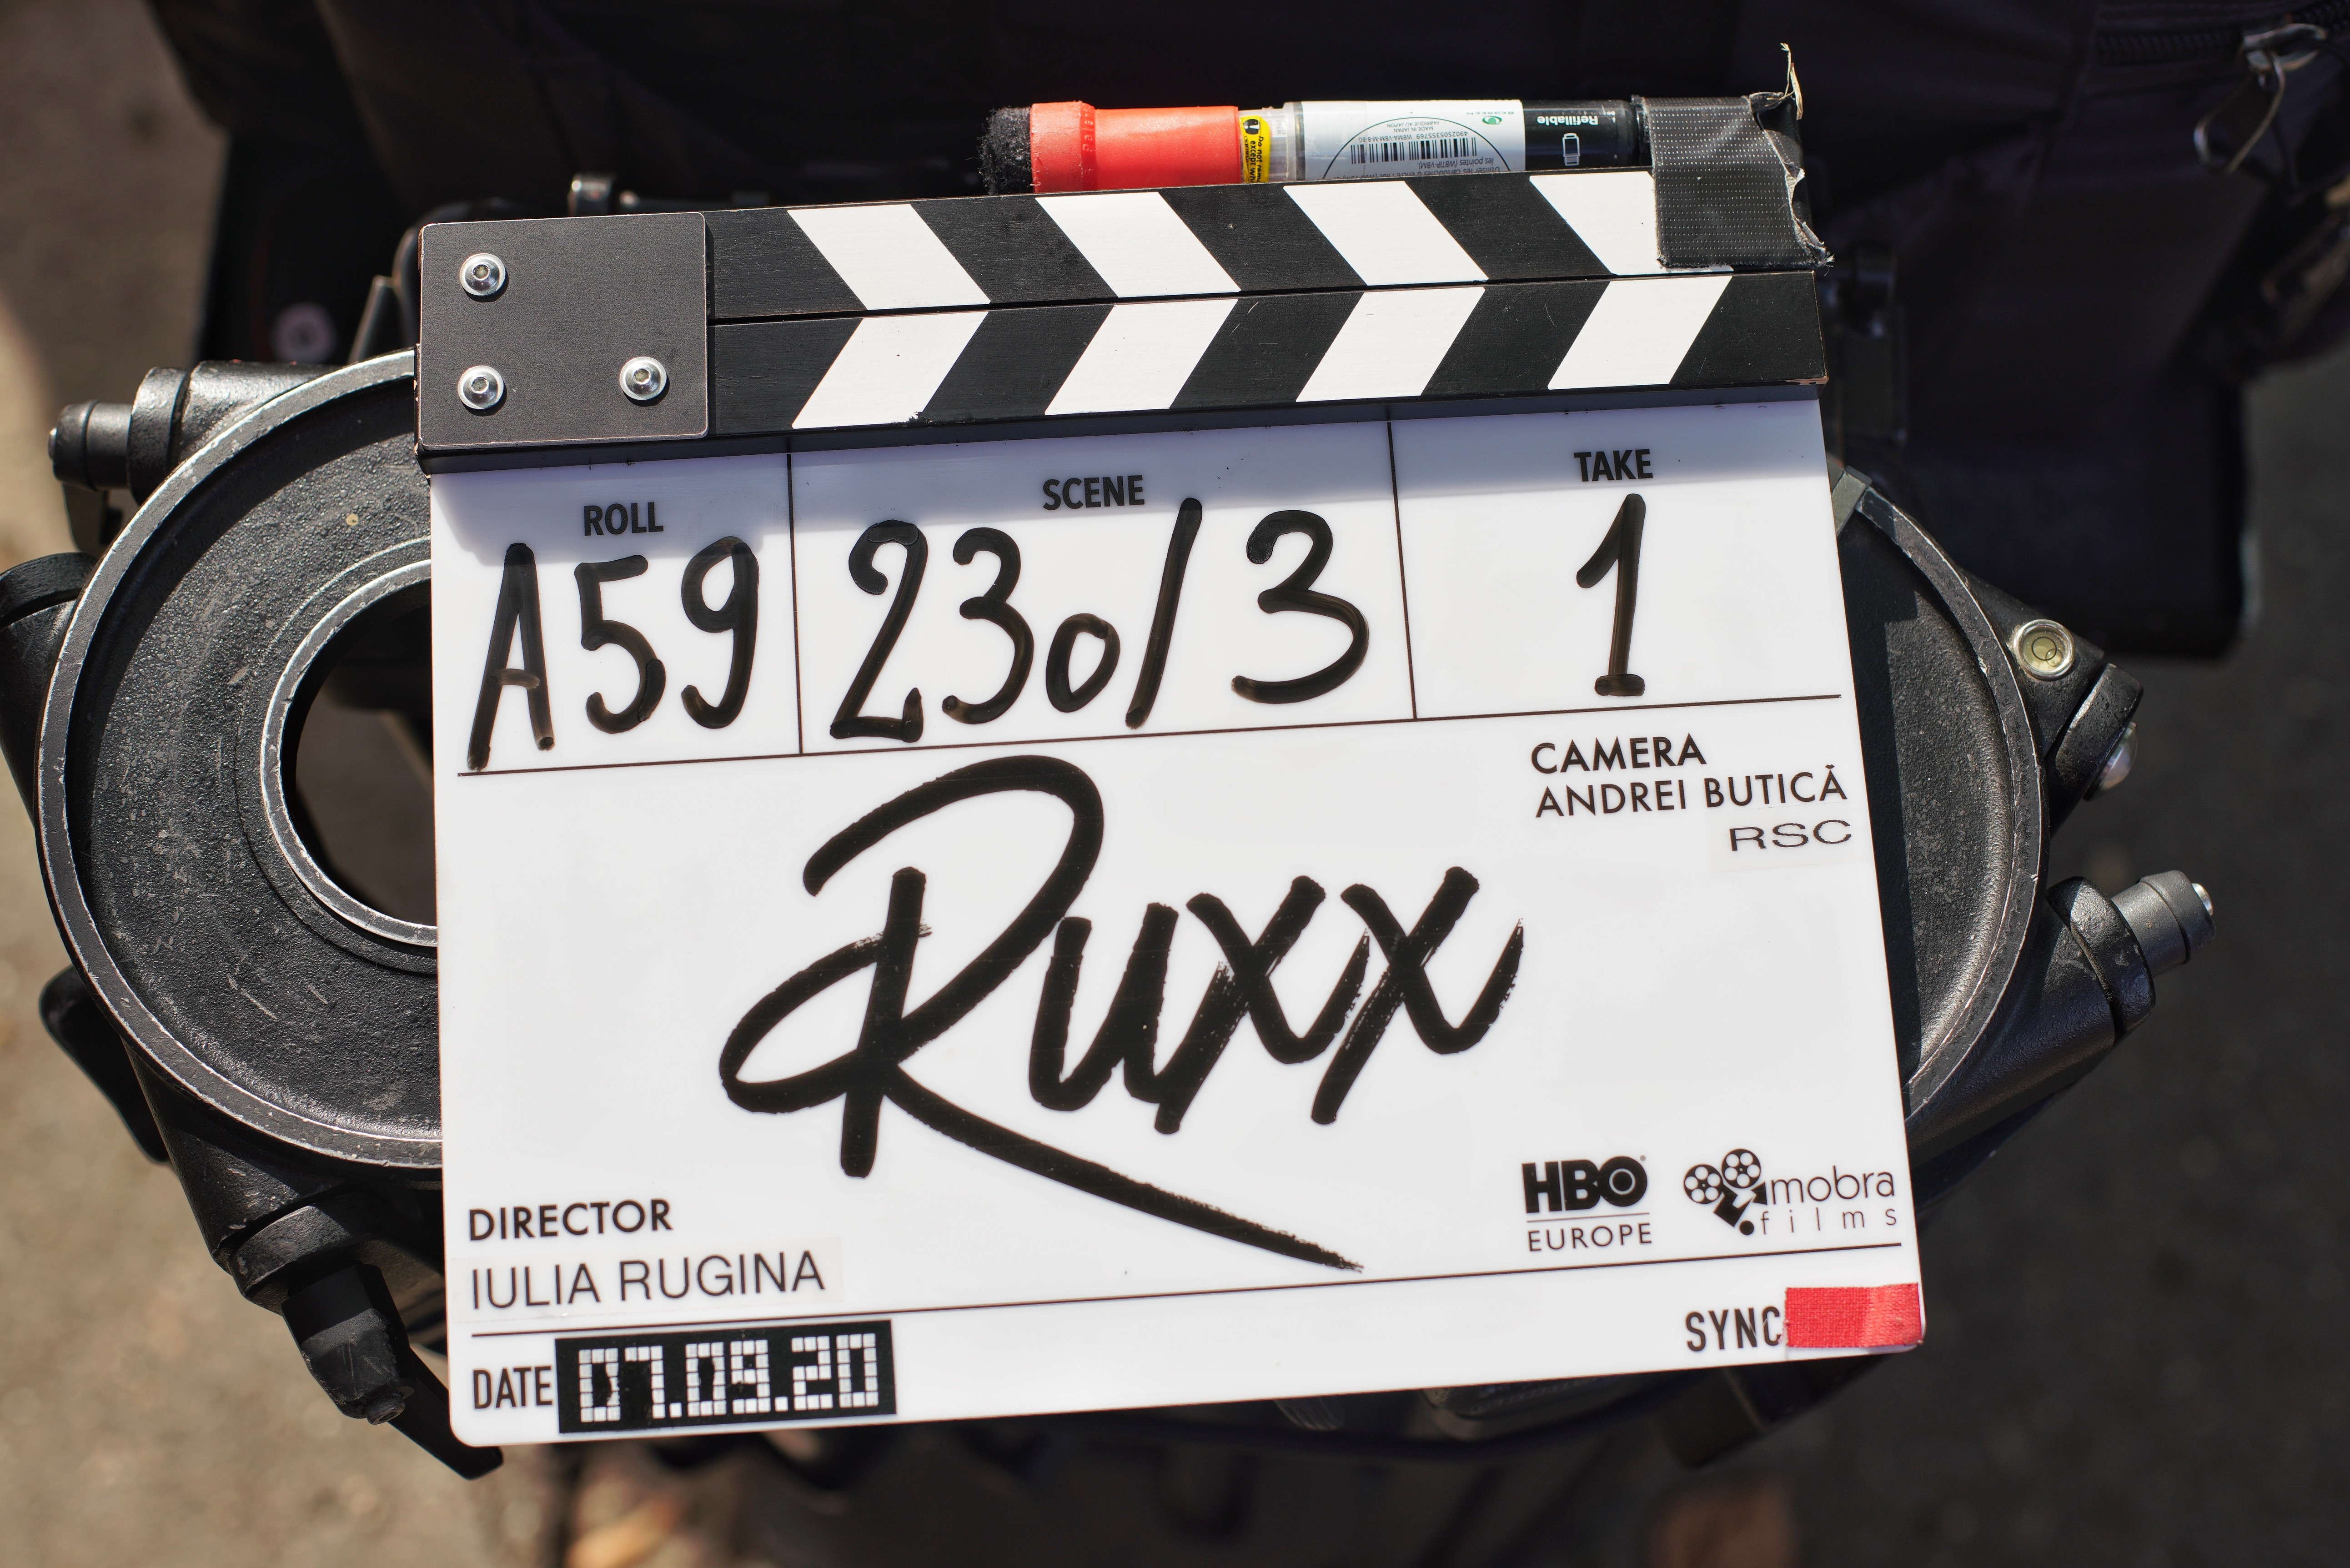 Ruxx - Photo